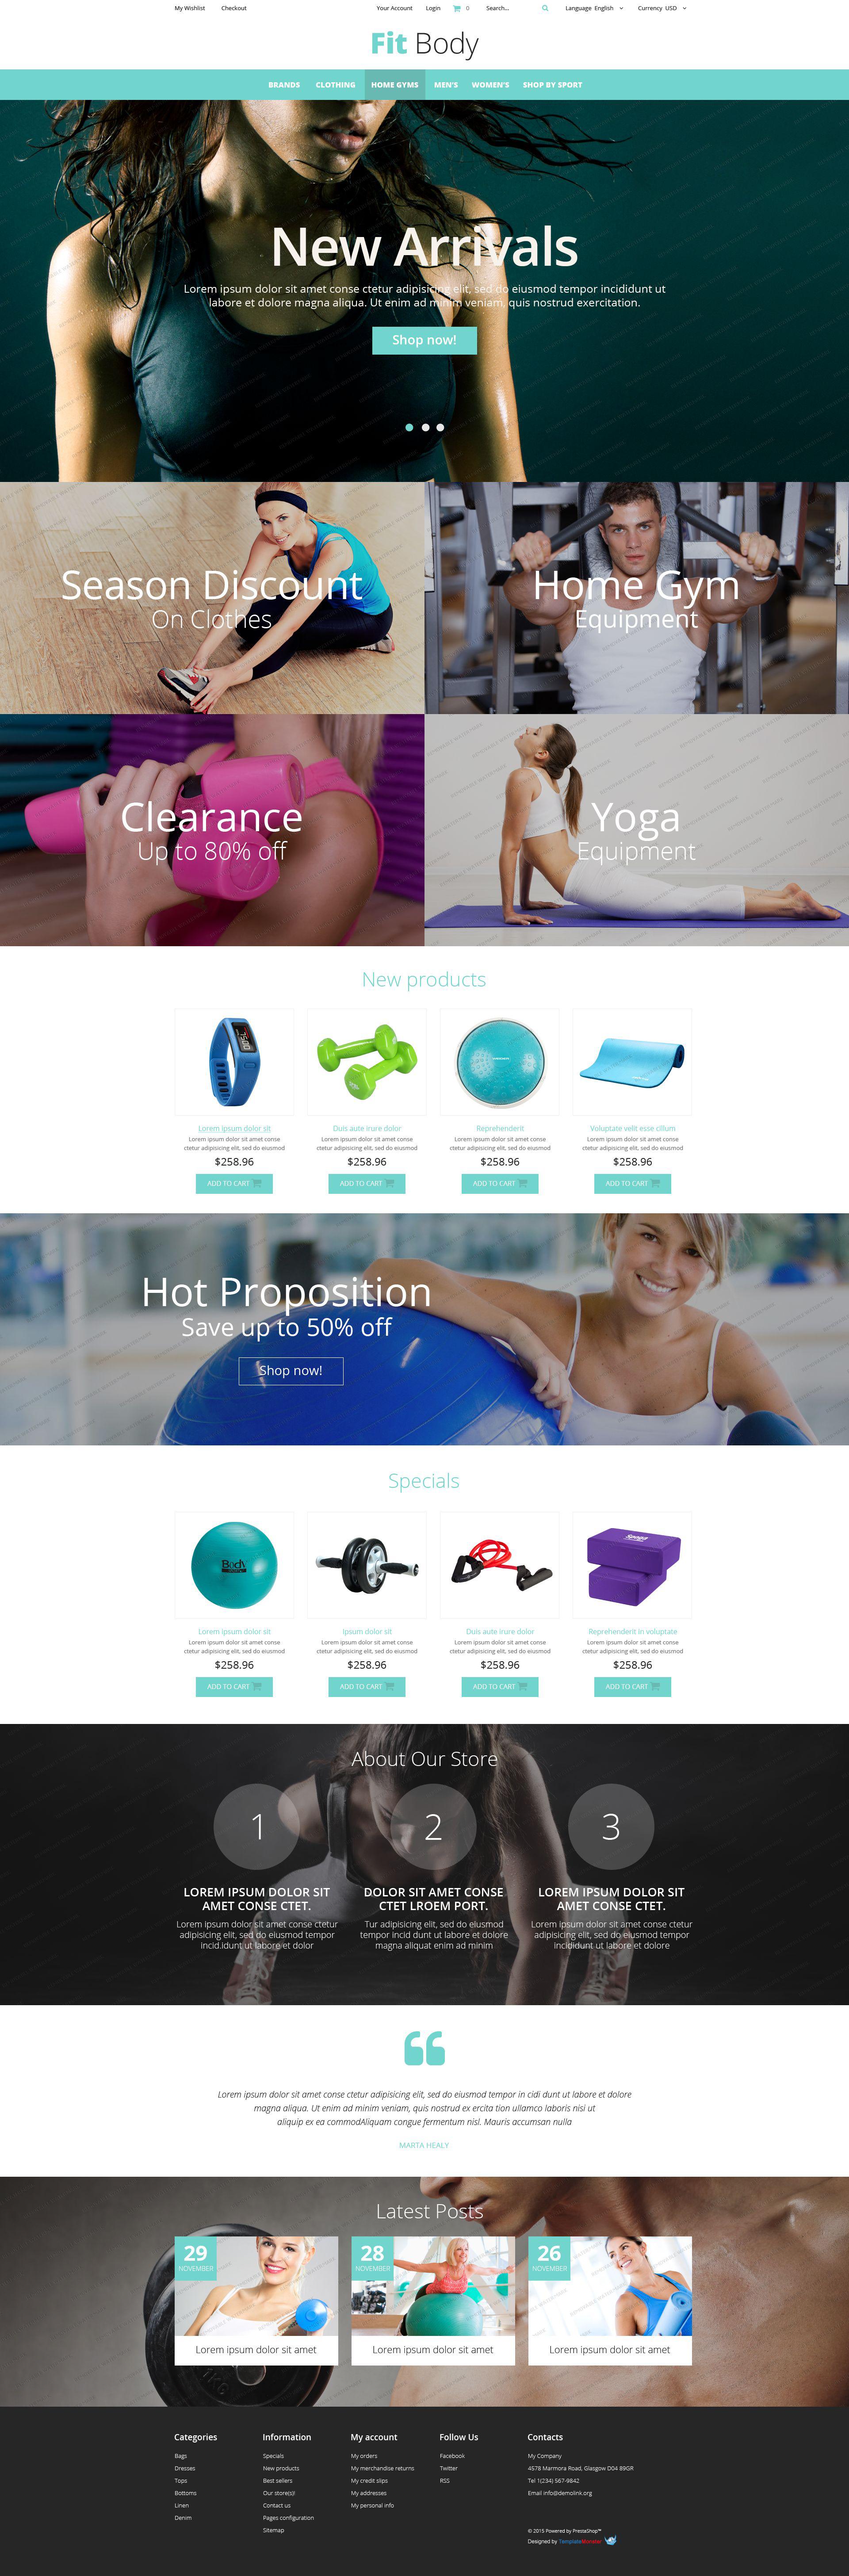 Responsywny szablon Magento Fitness Magento Free Theme #53327